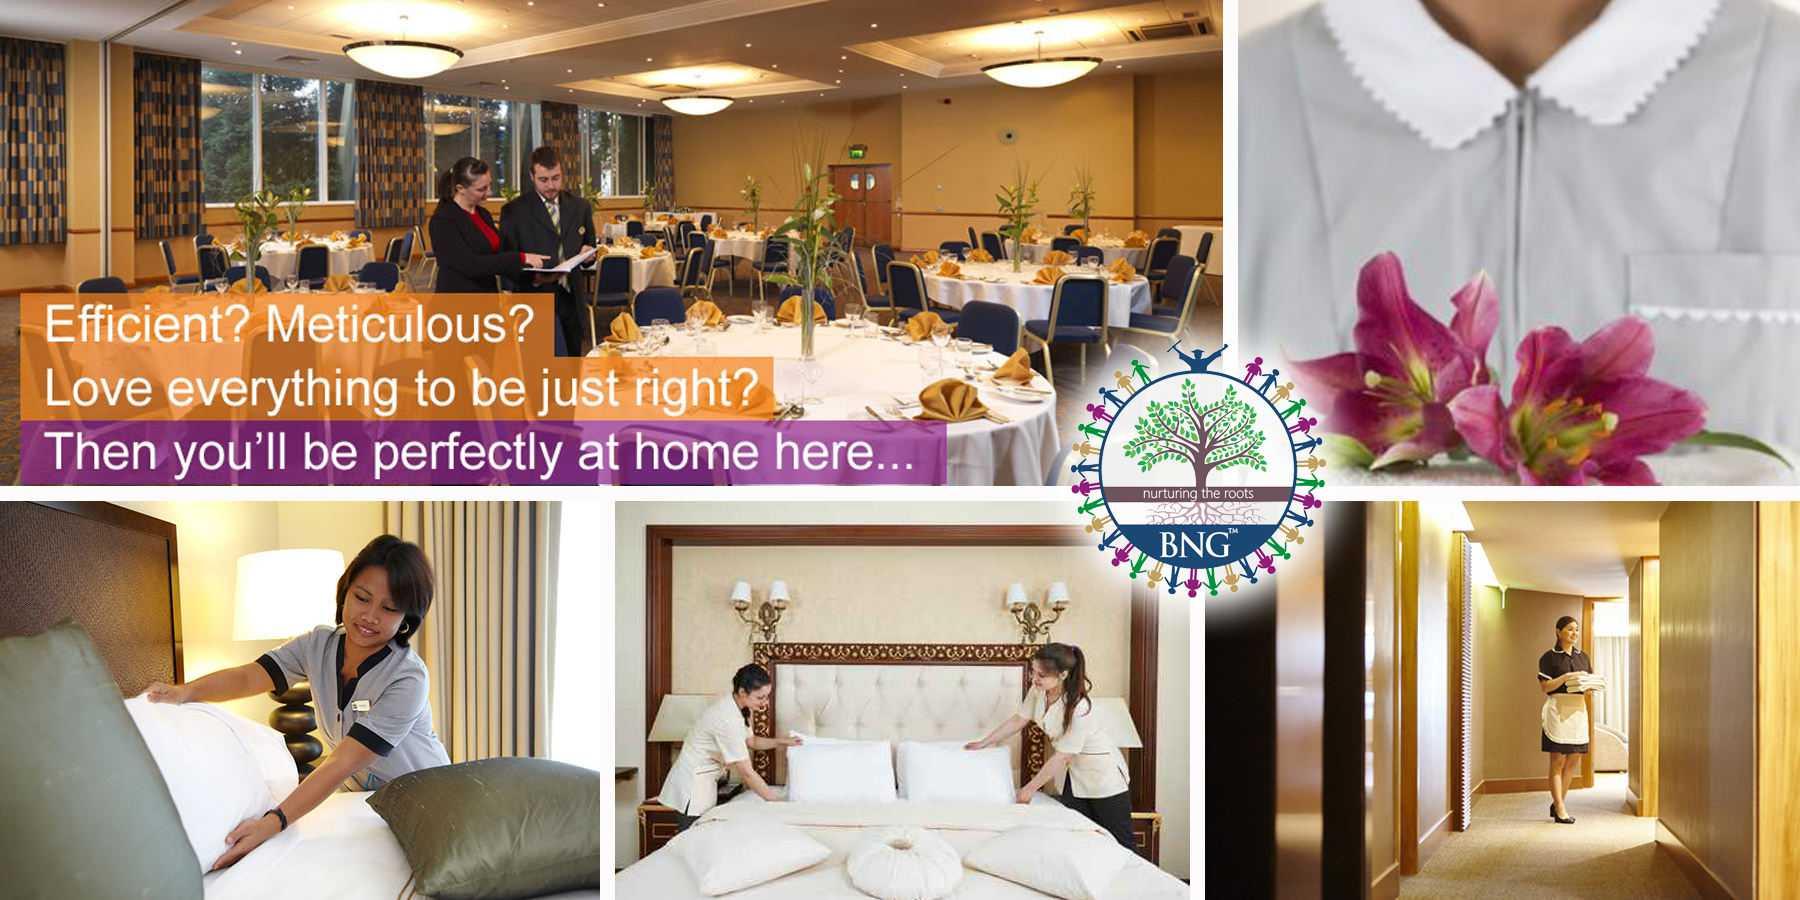 Housekeeping in Hotel » BNG Hotel Management Kolkata